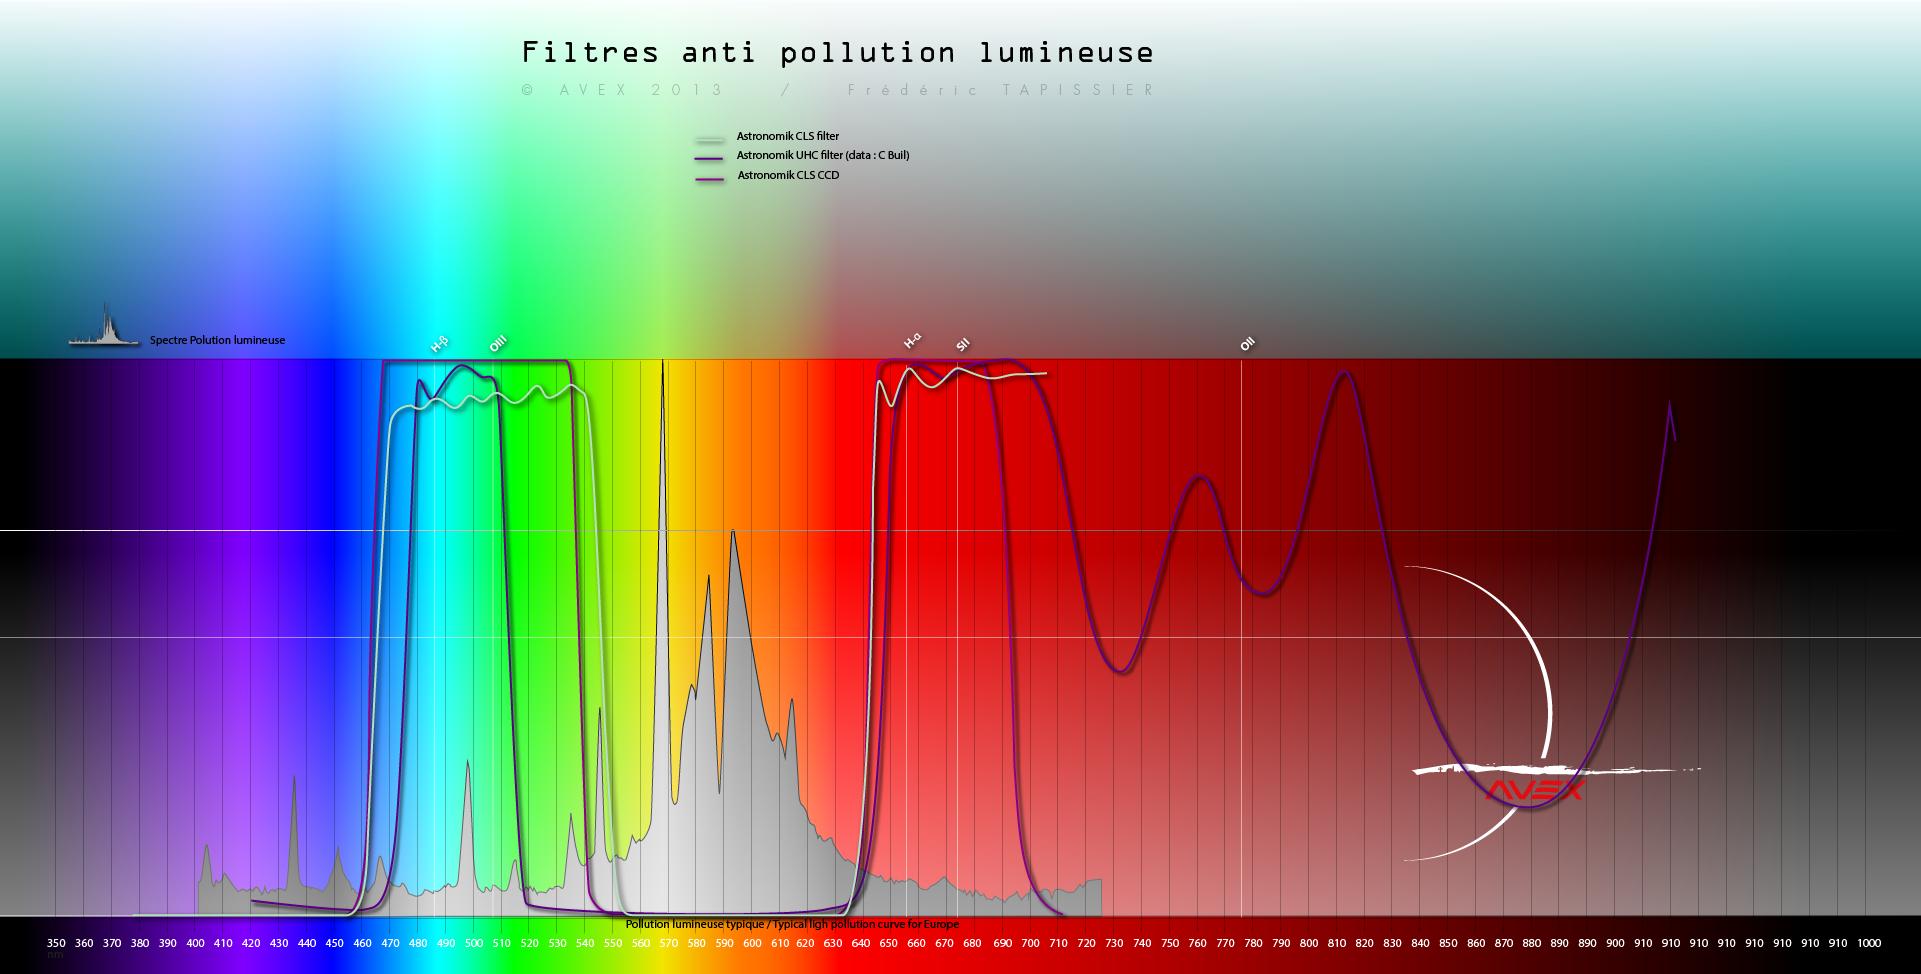 Filtre anti-pollution IDAS-LPS-D1 764834spectrefiltreavex7astronomik